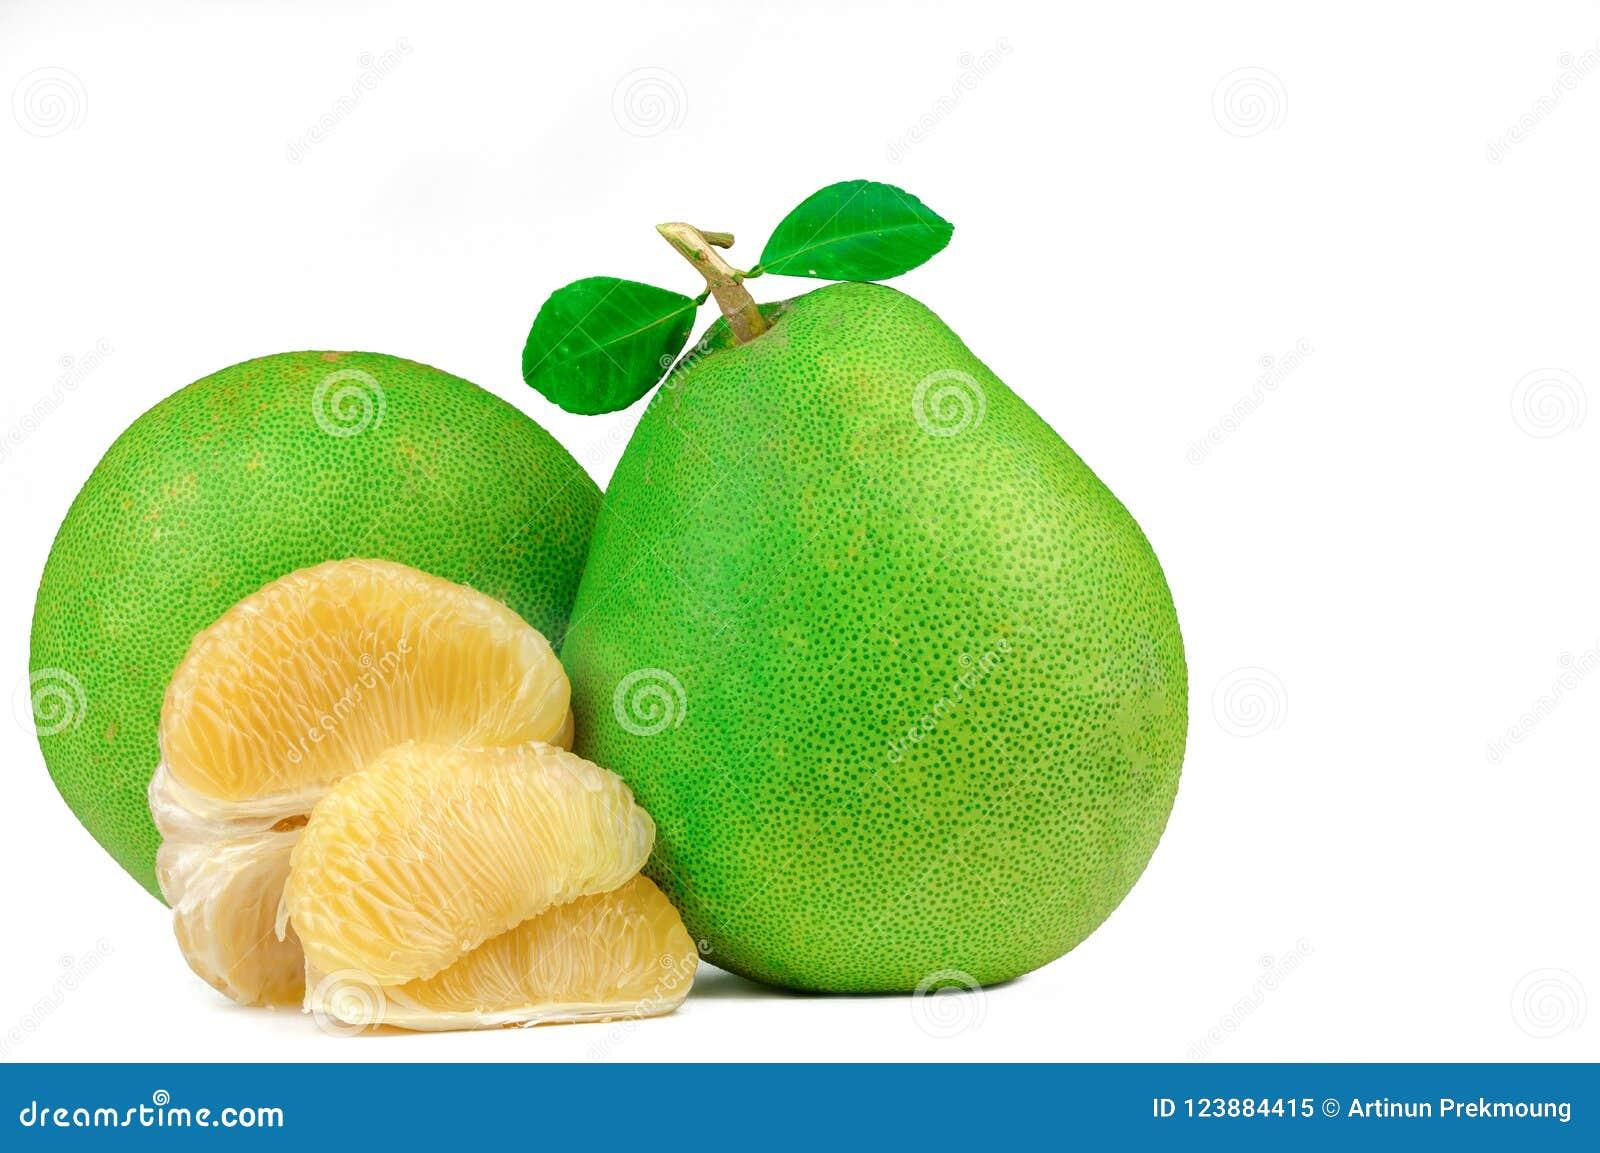 Pomelo πολτός χωρίς σπόρους που απομονώνονται στο άσπρο υπόβαθρο Pomelo της Ταϊλάνδης φρούτα Φυσική πηγή βιταμίνης C και καλίου Υ